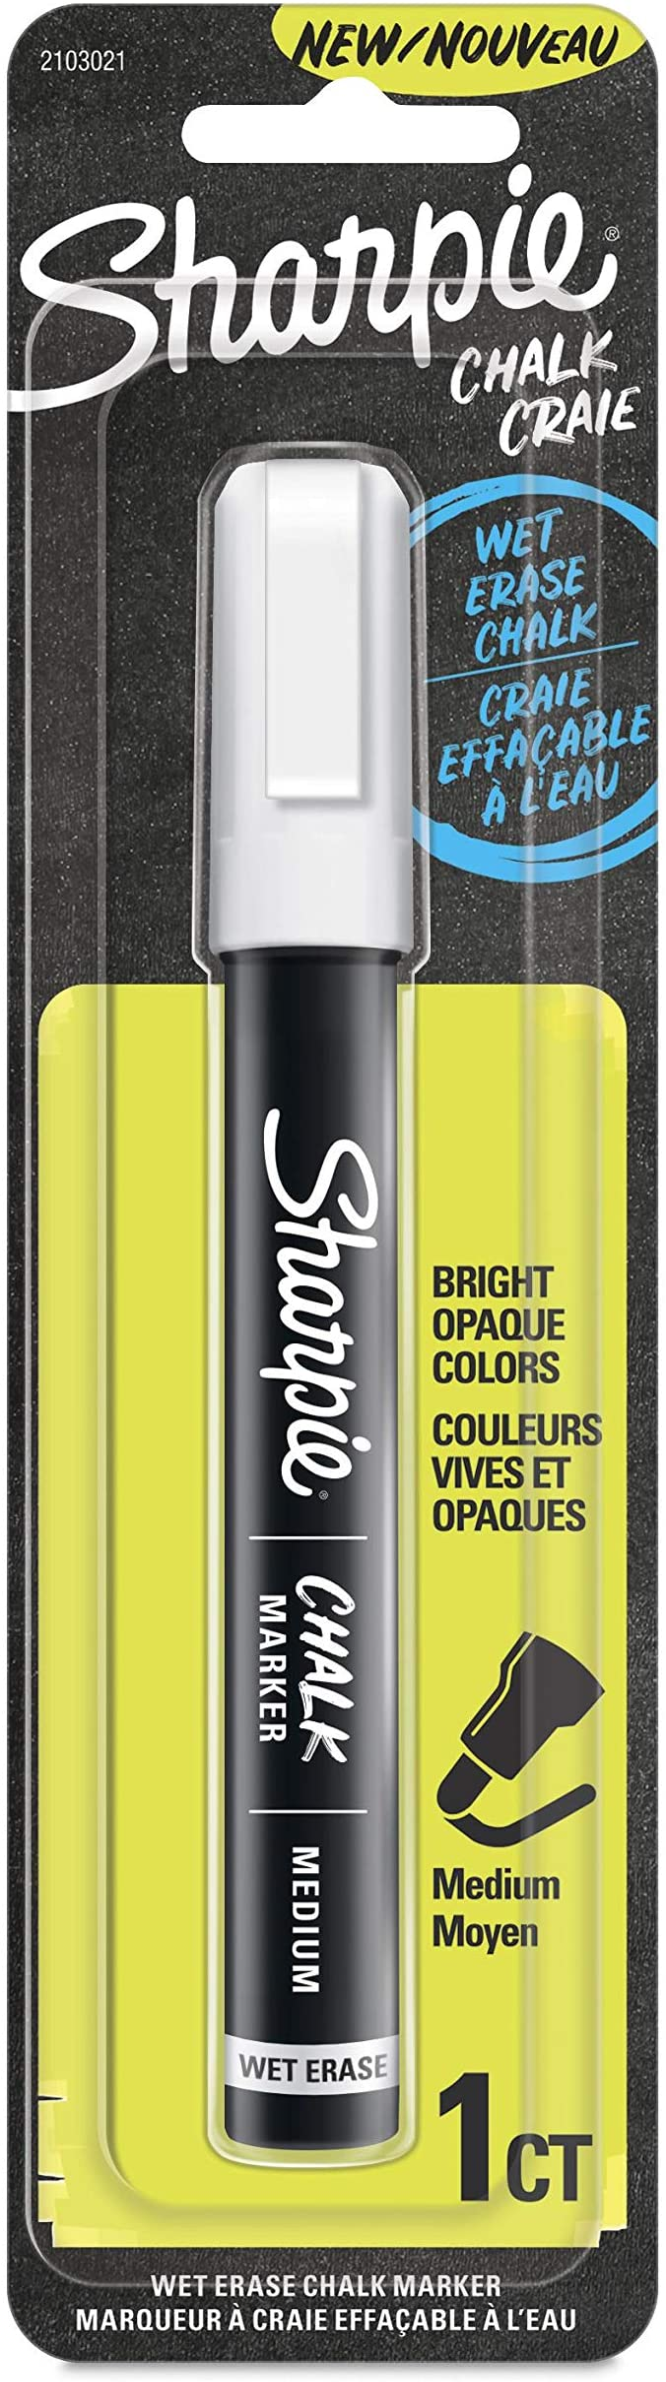 Sharpie Chalk Marker 3 Count Wet Erase Markers Assorted Colors